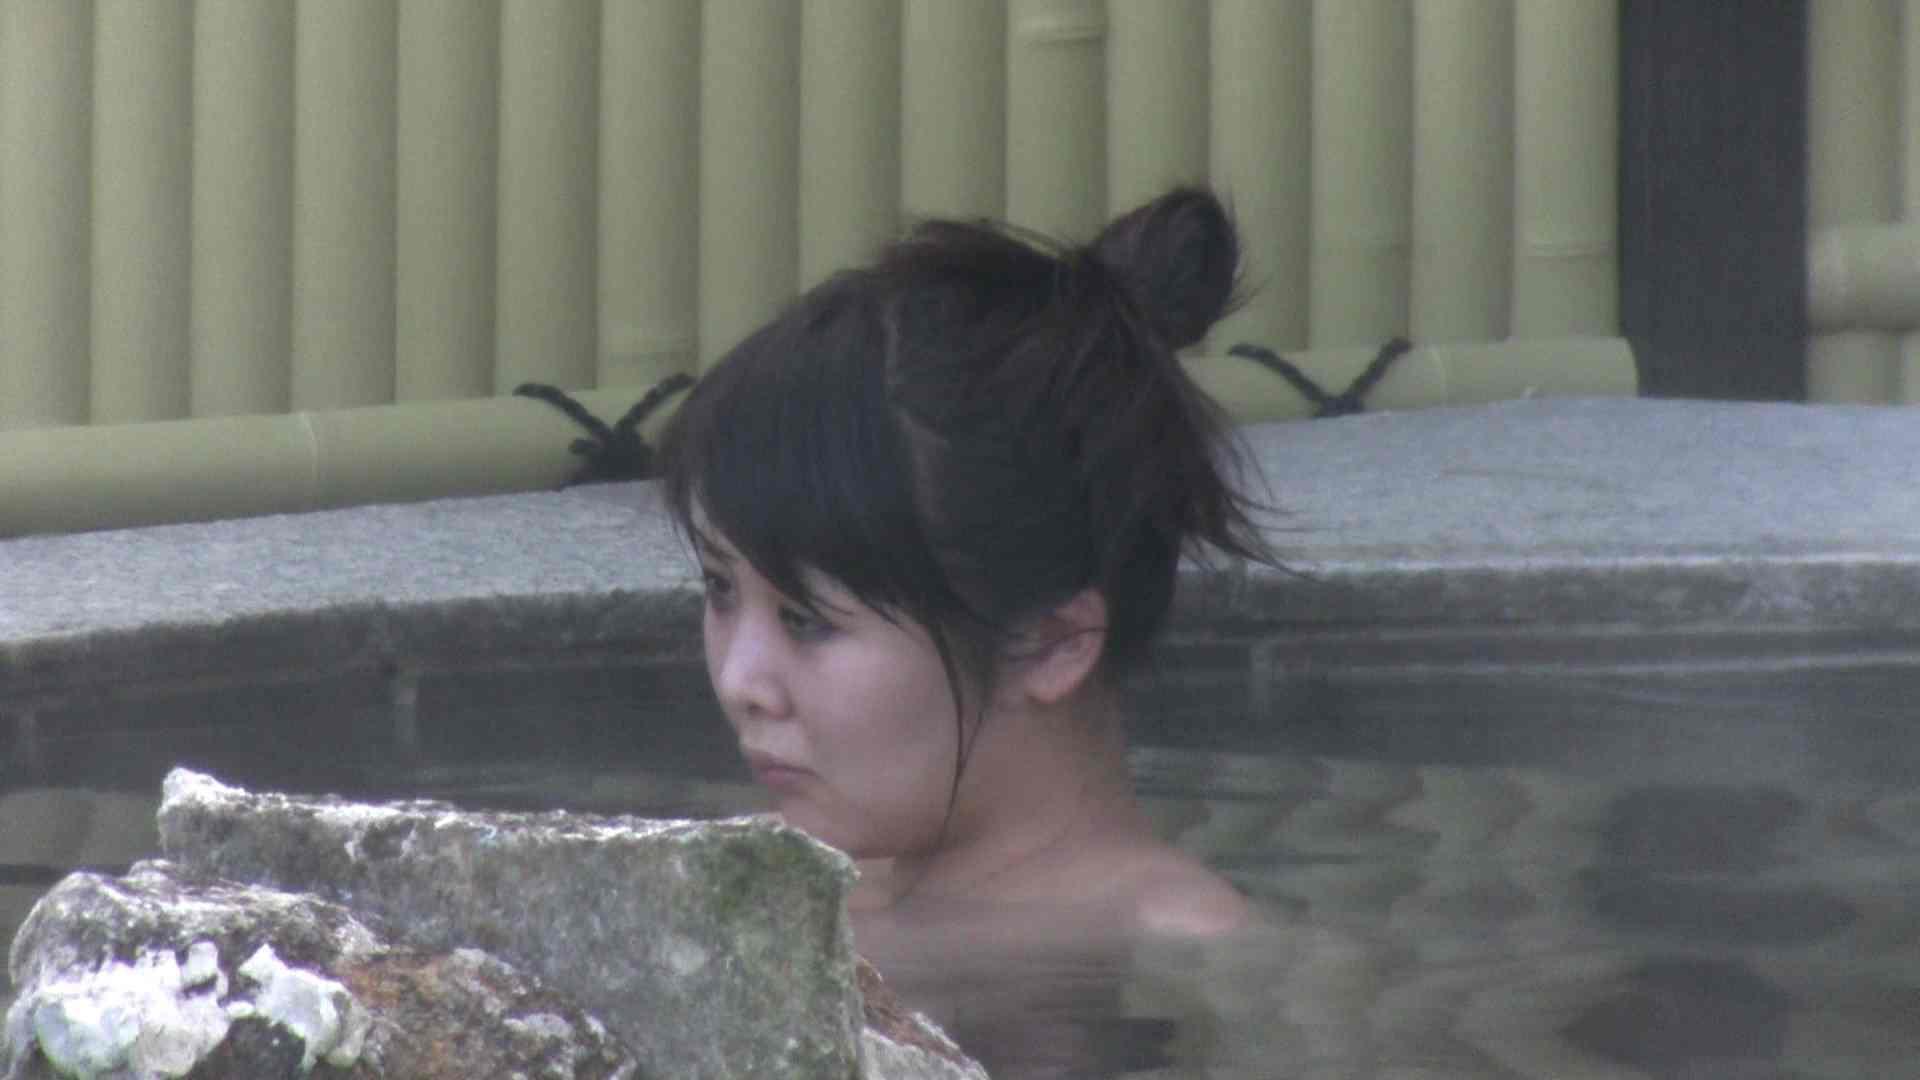 Aquaな露天風呂Vol.118 OL女体 | 露天  68連発 31